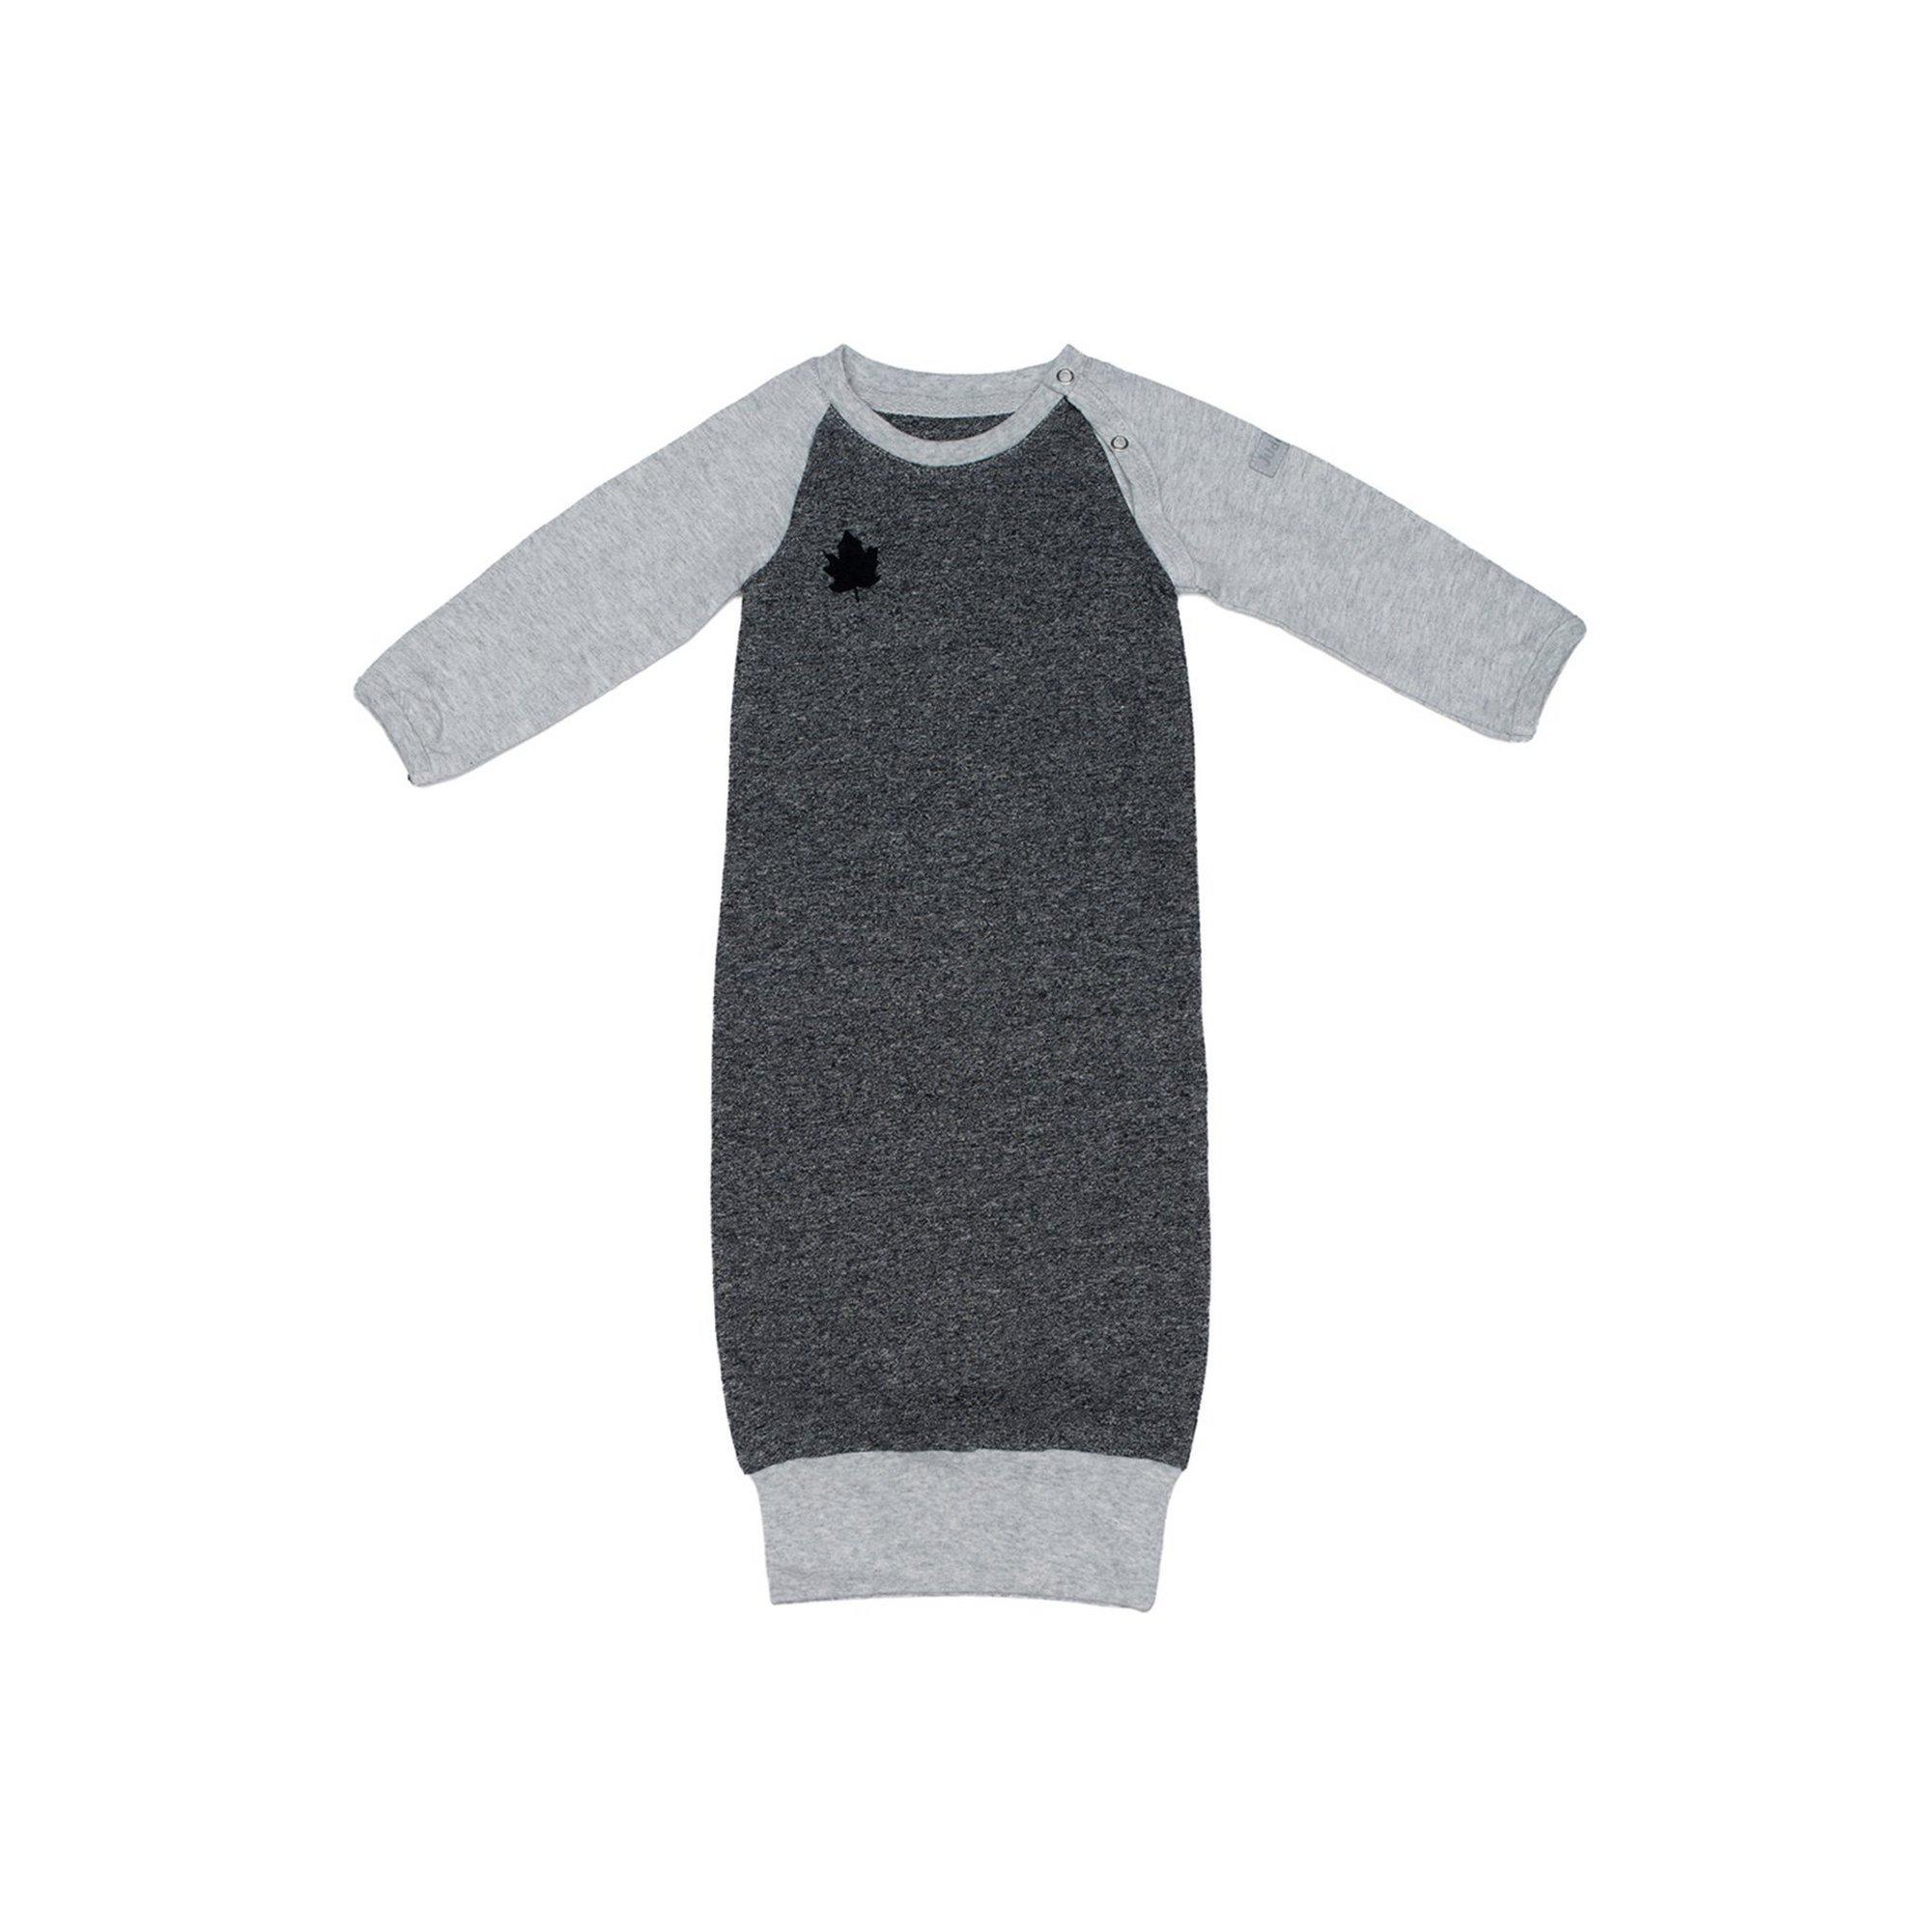 Image of Juddlies Raglan Collection Nightgown Graphite Black